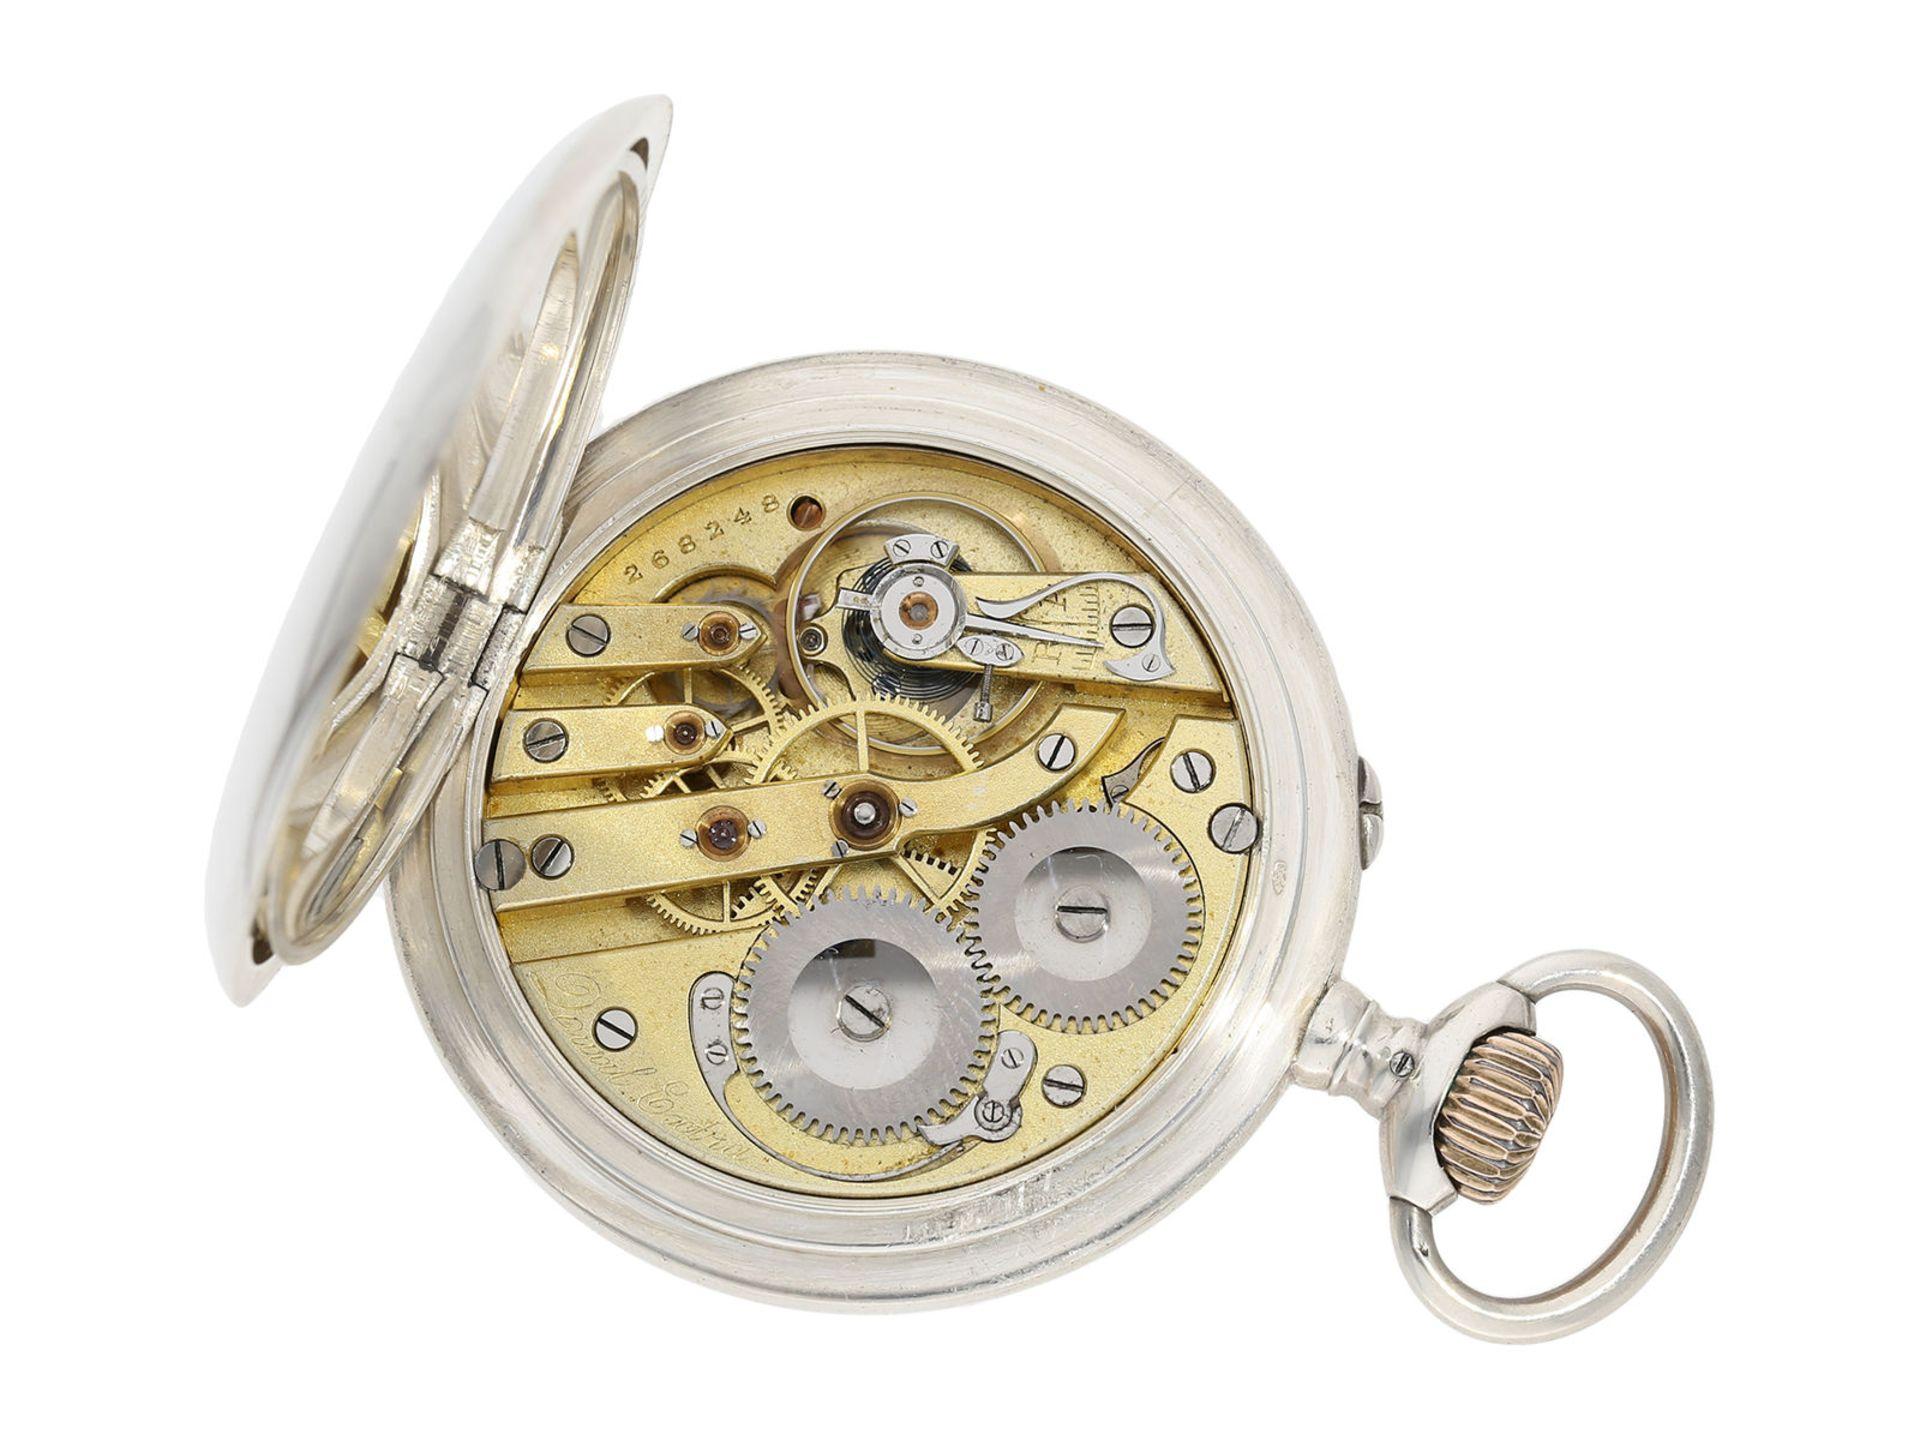 "Pocket watch: early IWC man's pocket watch rare quality ""Extra"", Schaffhausen 1902, delivered to - Bild 2 aus 6"